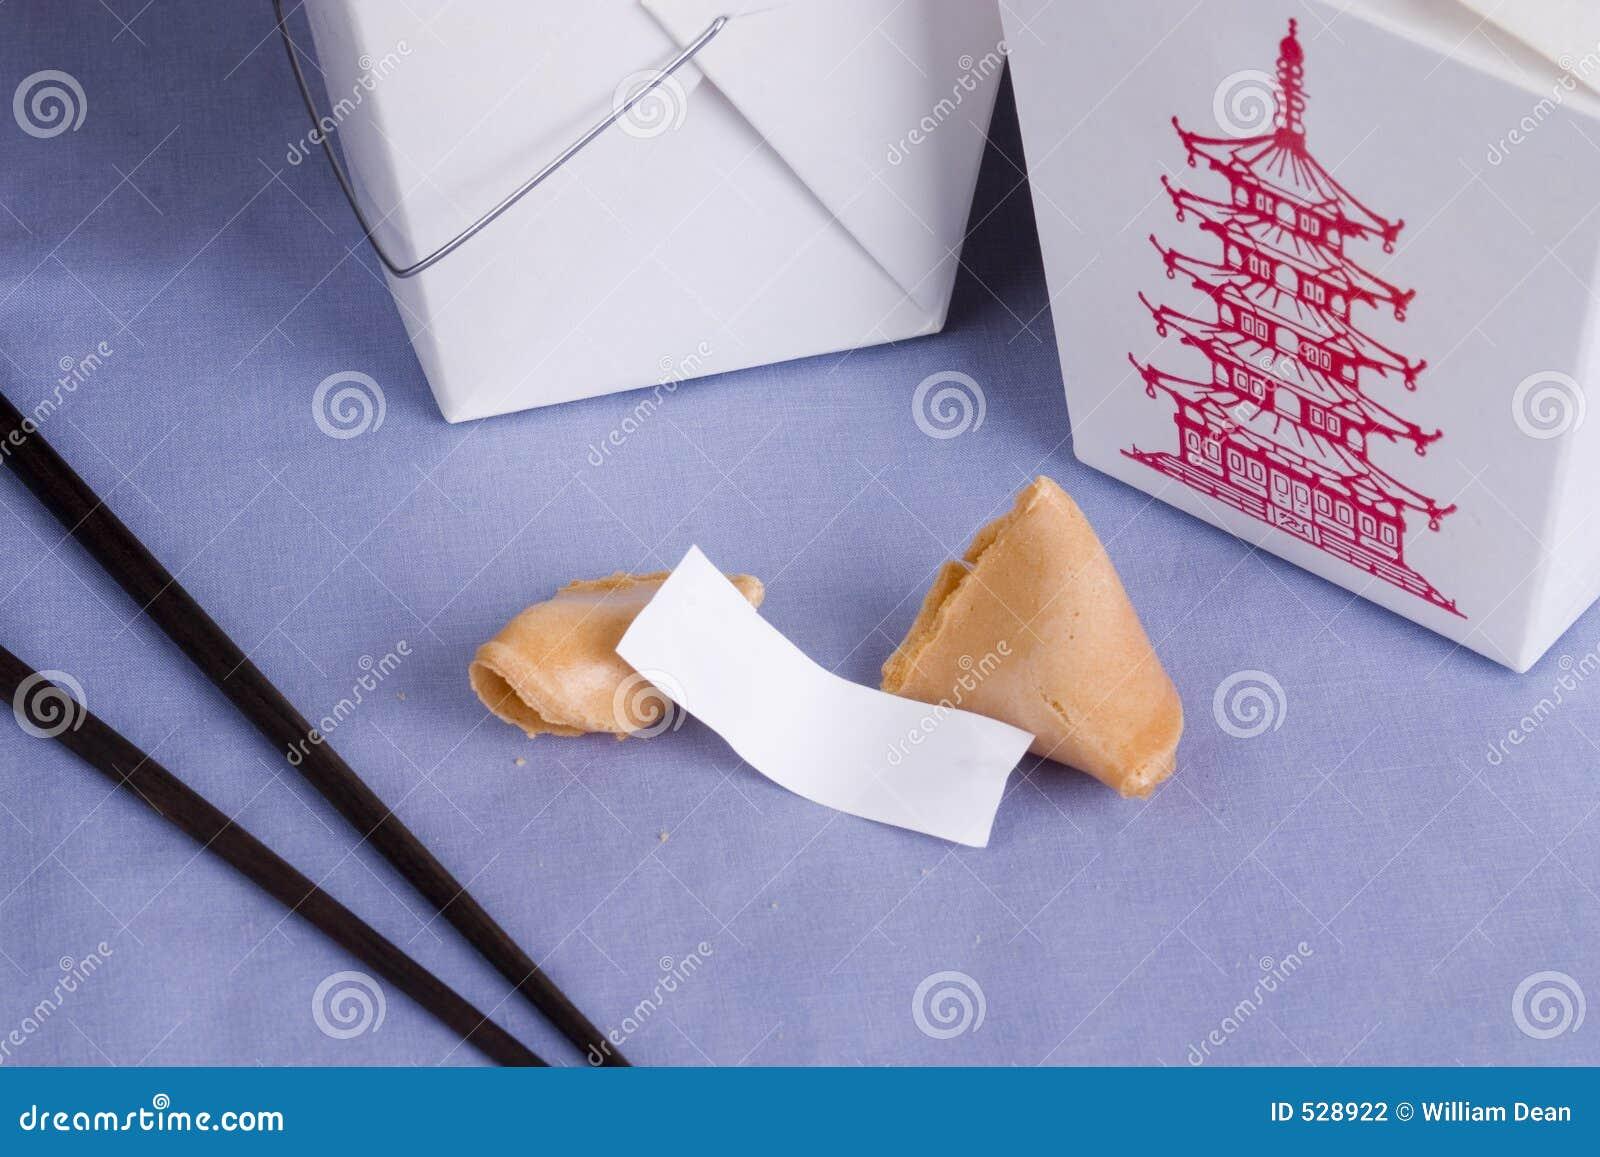 Download 外卖的时运 库存照片. 图片 包括有 棚车, 东方, 正餐, 蓝色, 时运, 棍子, 发运, 汉语, 作为, 面包屑 - 528922